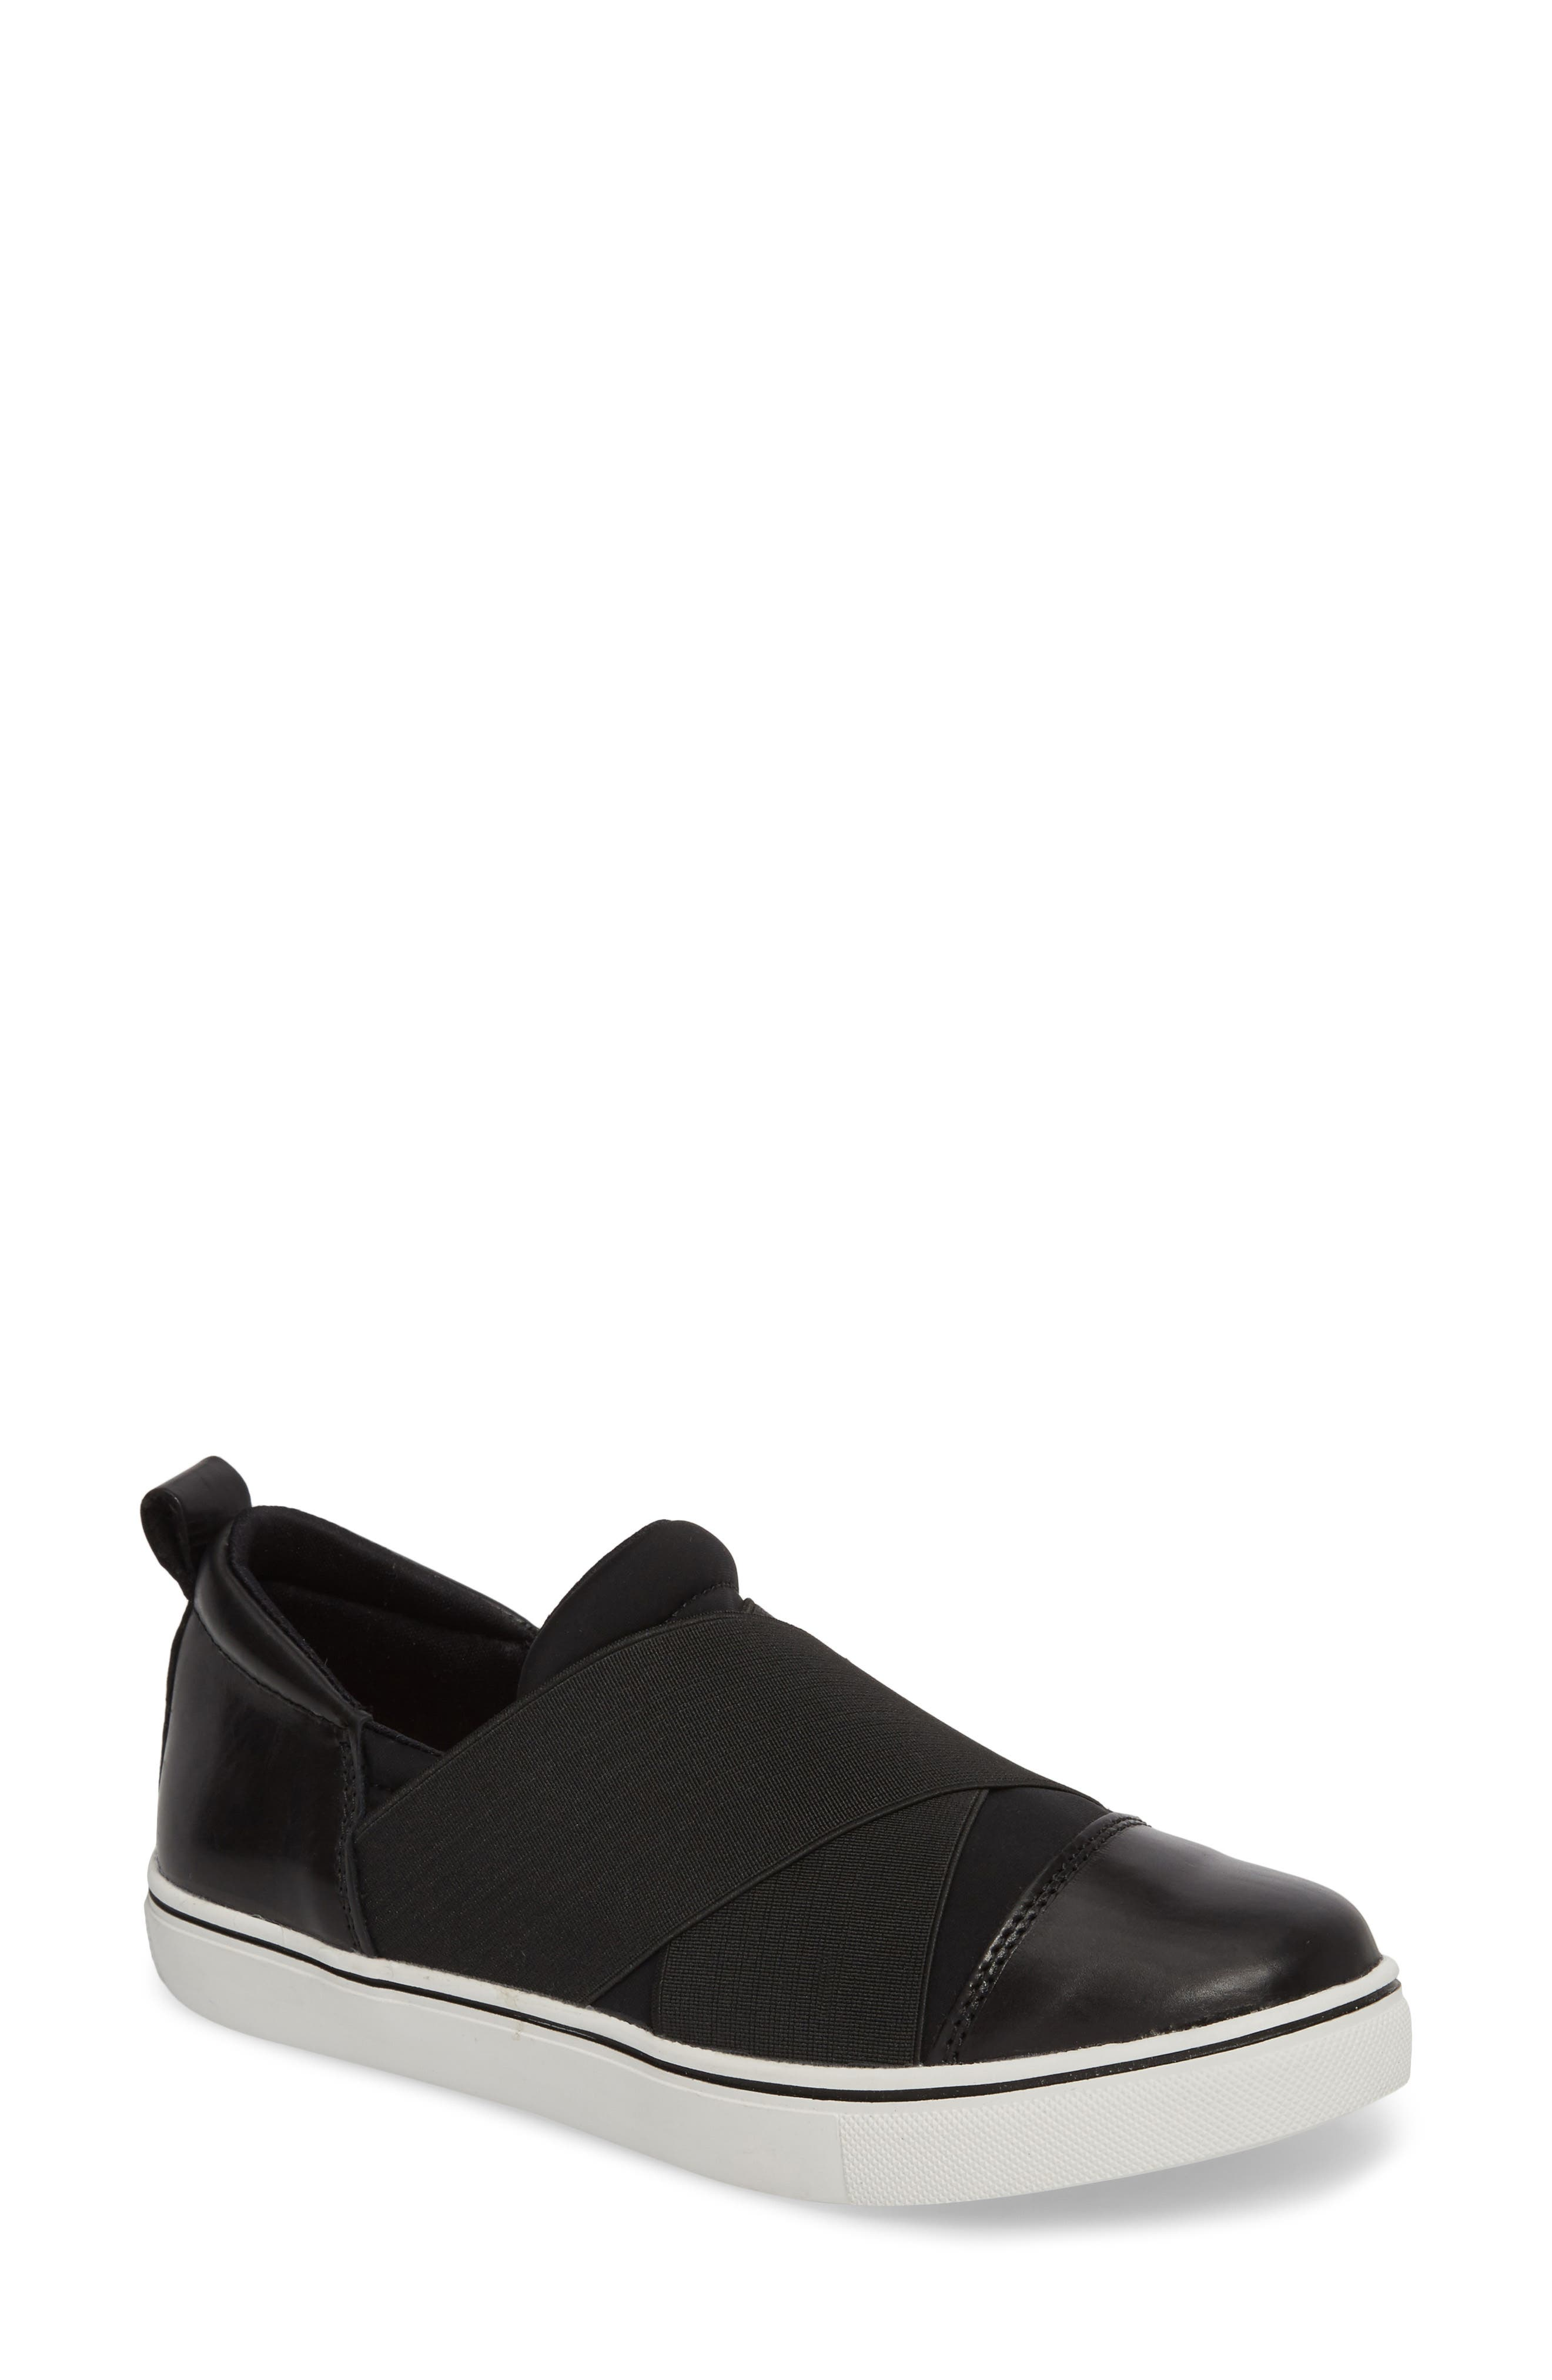 Elmwood Slip-On Sneaker,                         Main,                         color, BLACK LEATHER